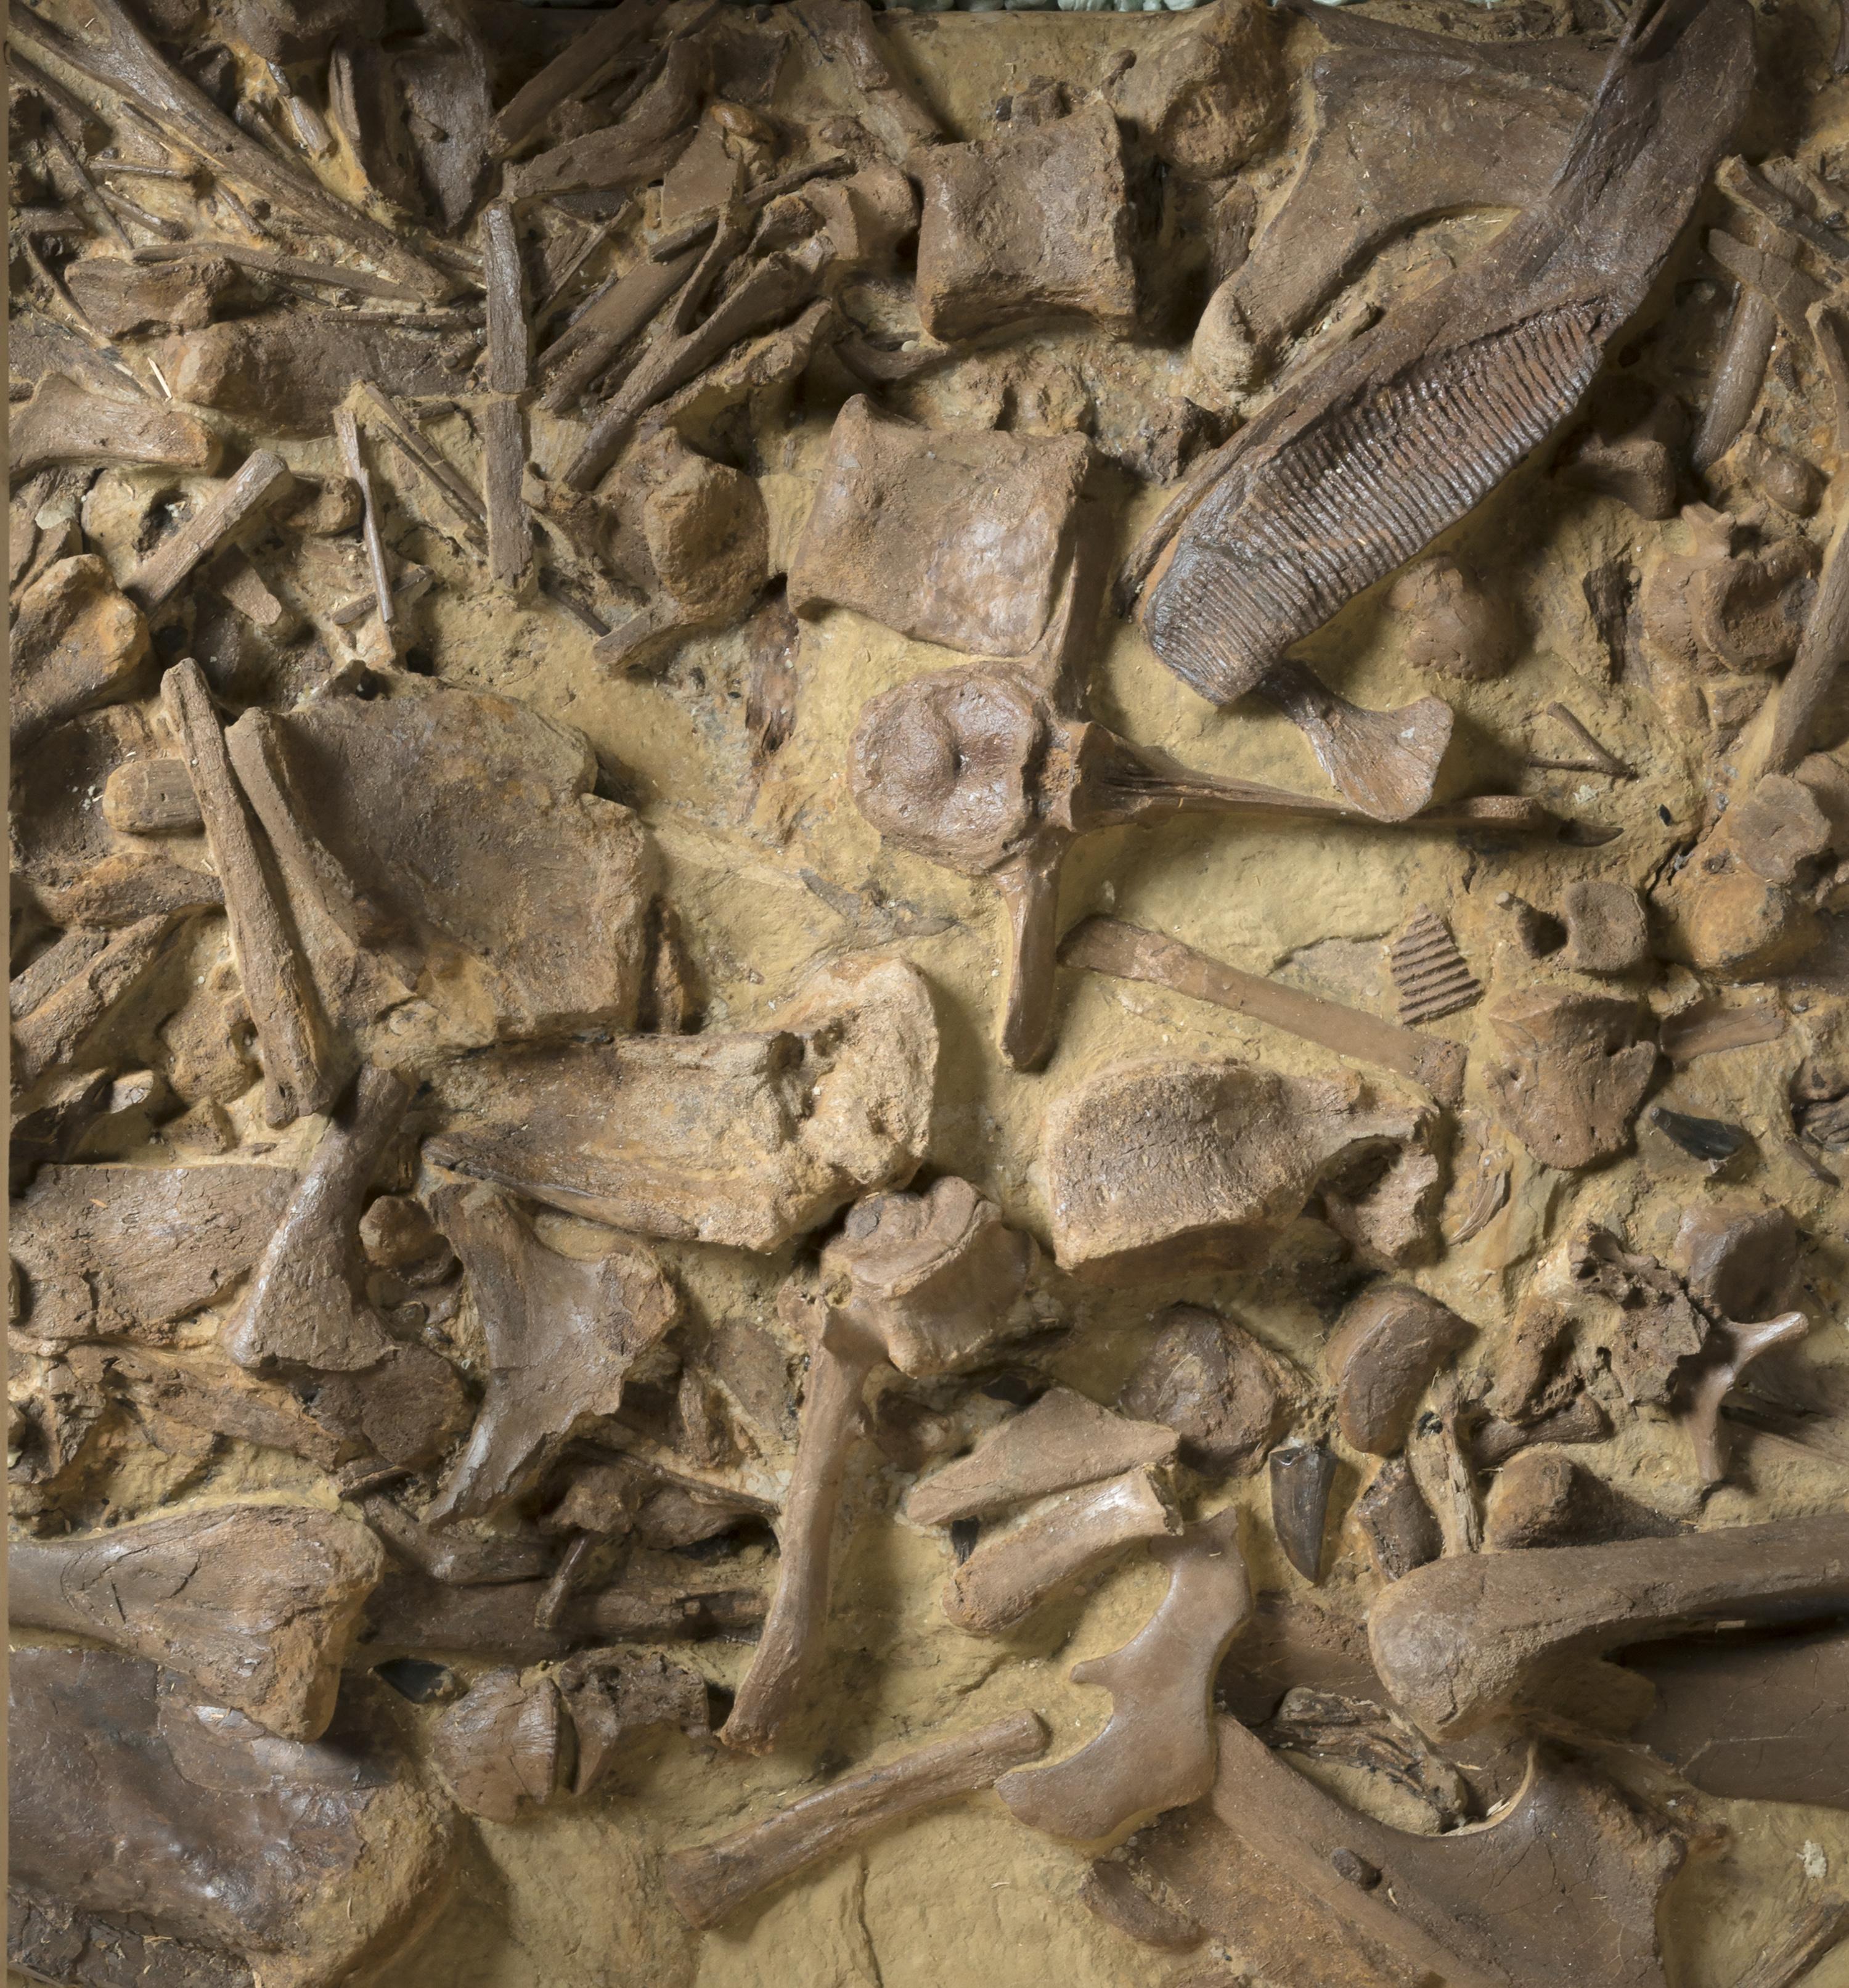 Denver News Closures: 'Spectacular' Dinosaur Fossil Collection